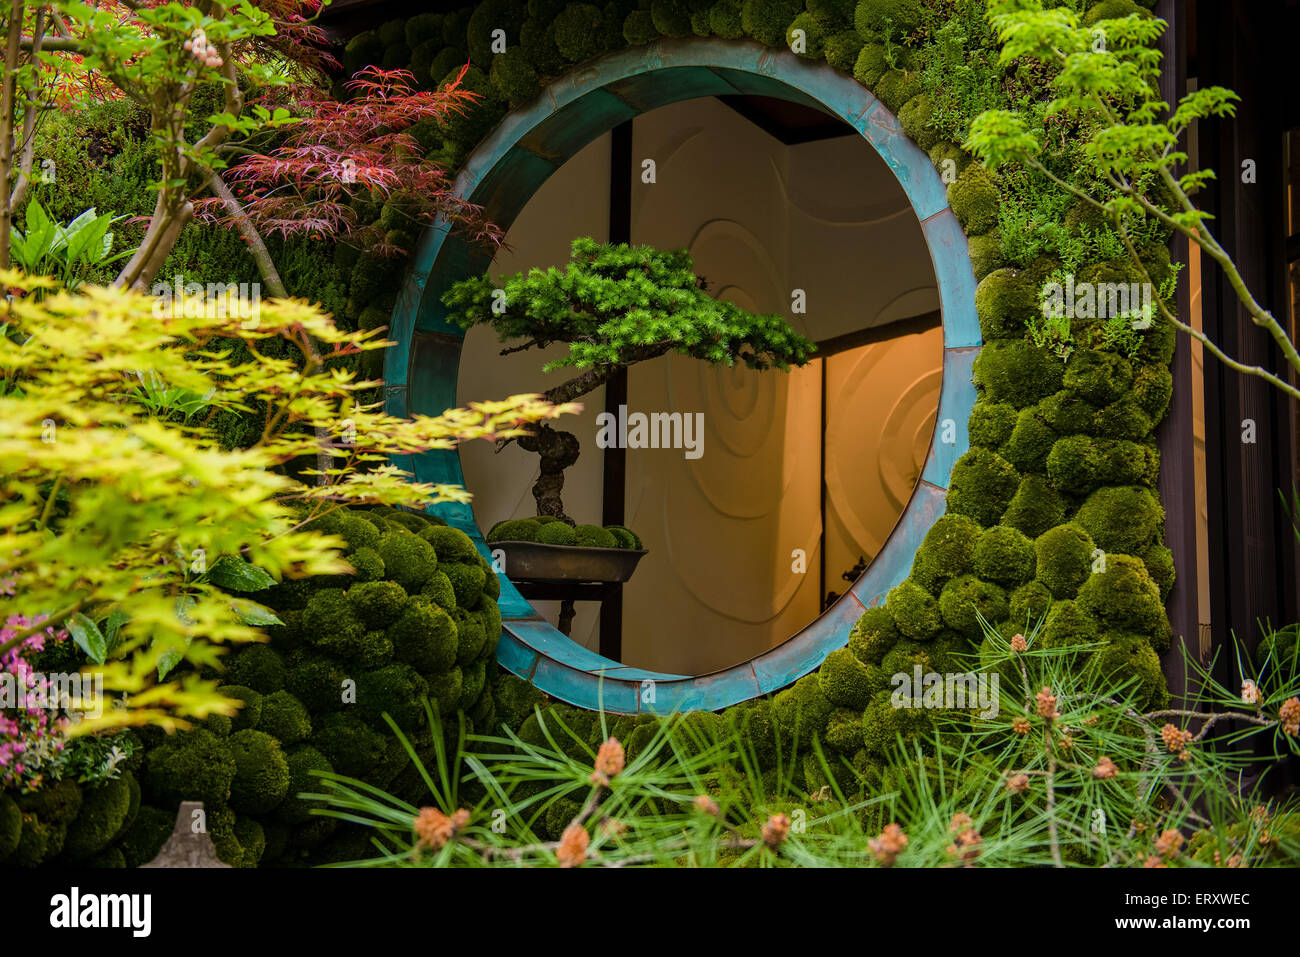 Edo no Niwa - Edo Garden by Ishihara Kazuyuki Design Laboratory, Chelsea Flower Show 2015 - Stock Image